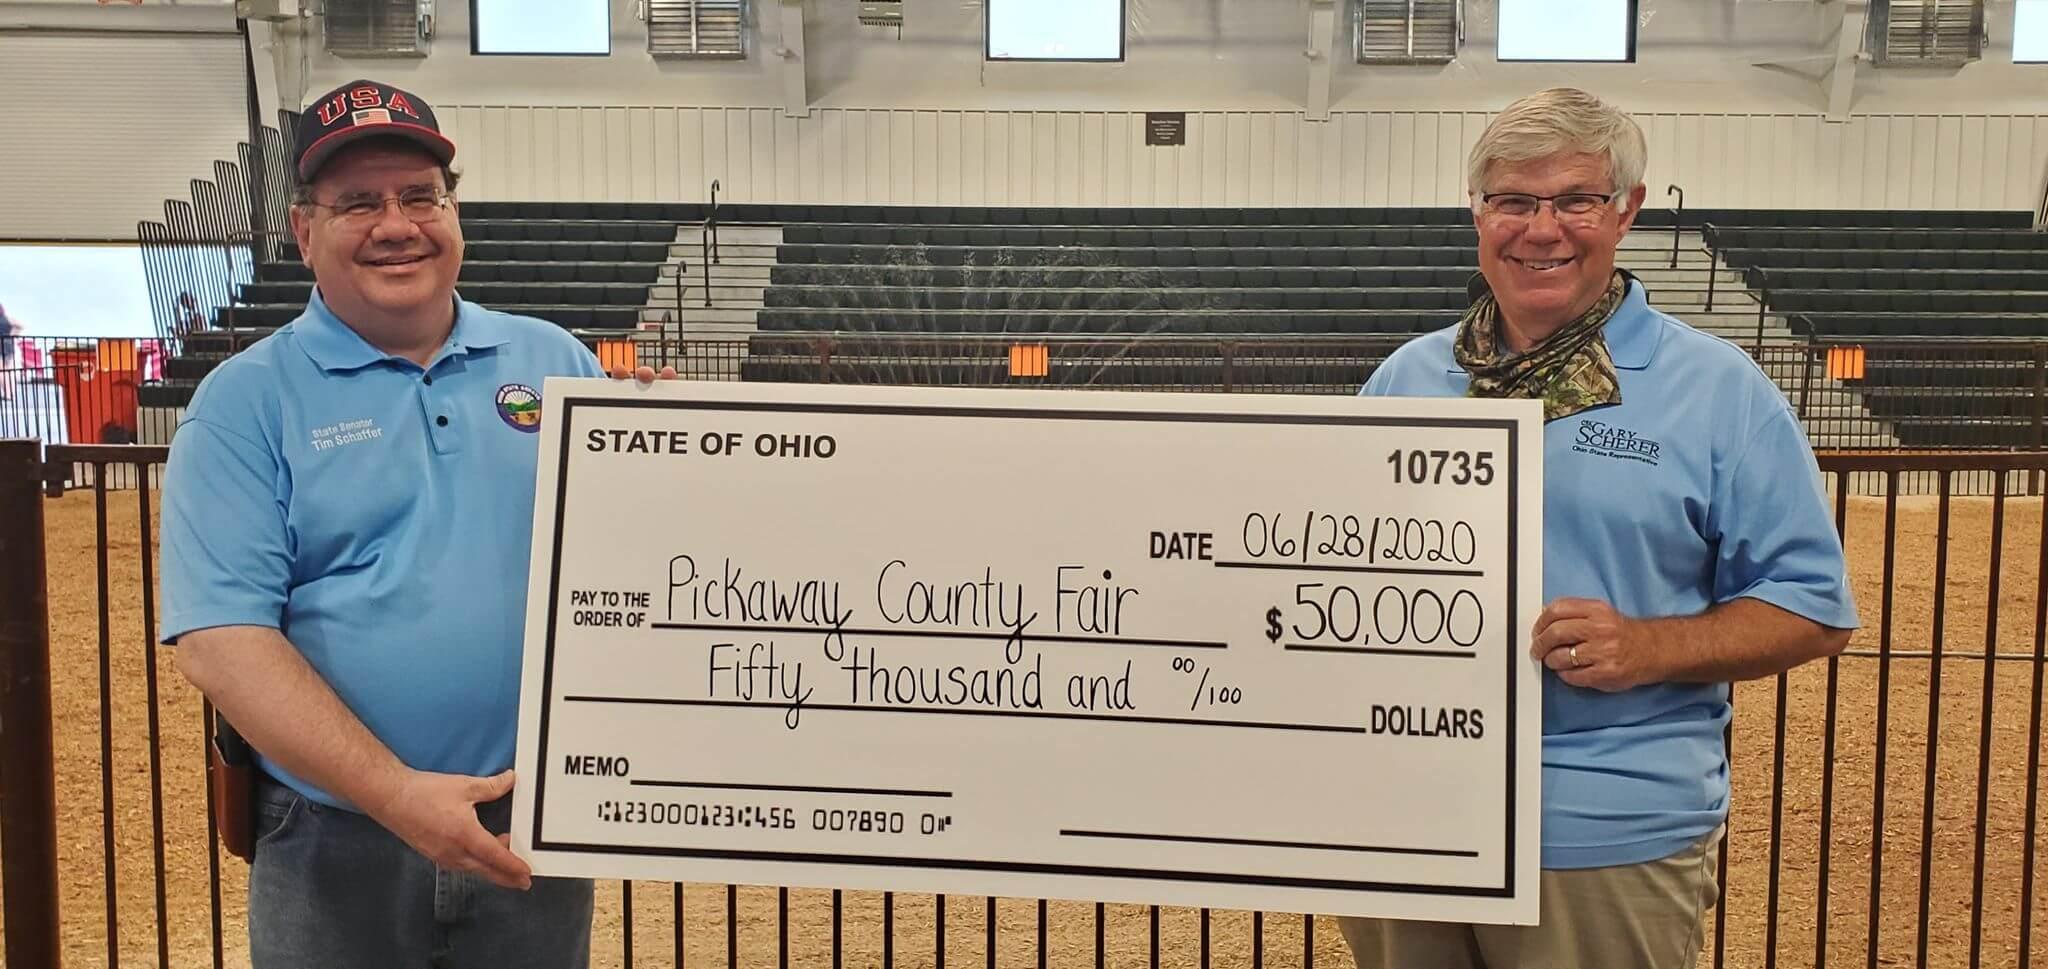 Pickaway County Fair receives $50,000 grant